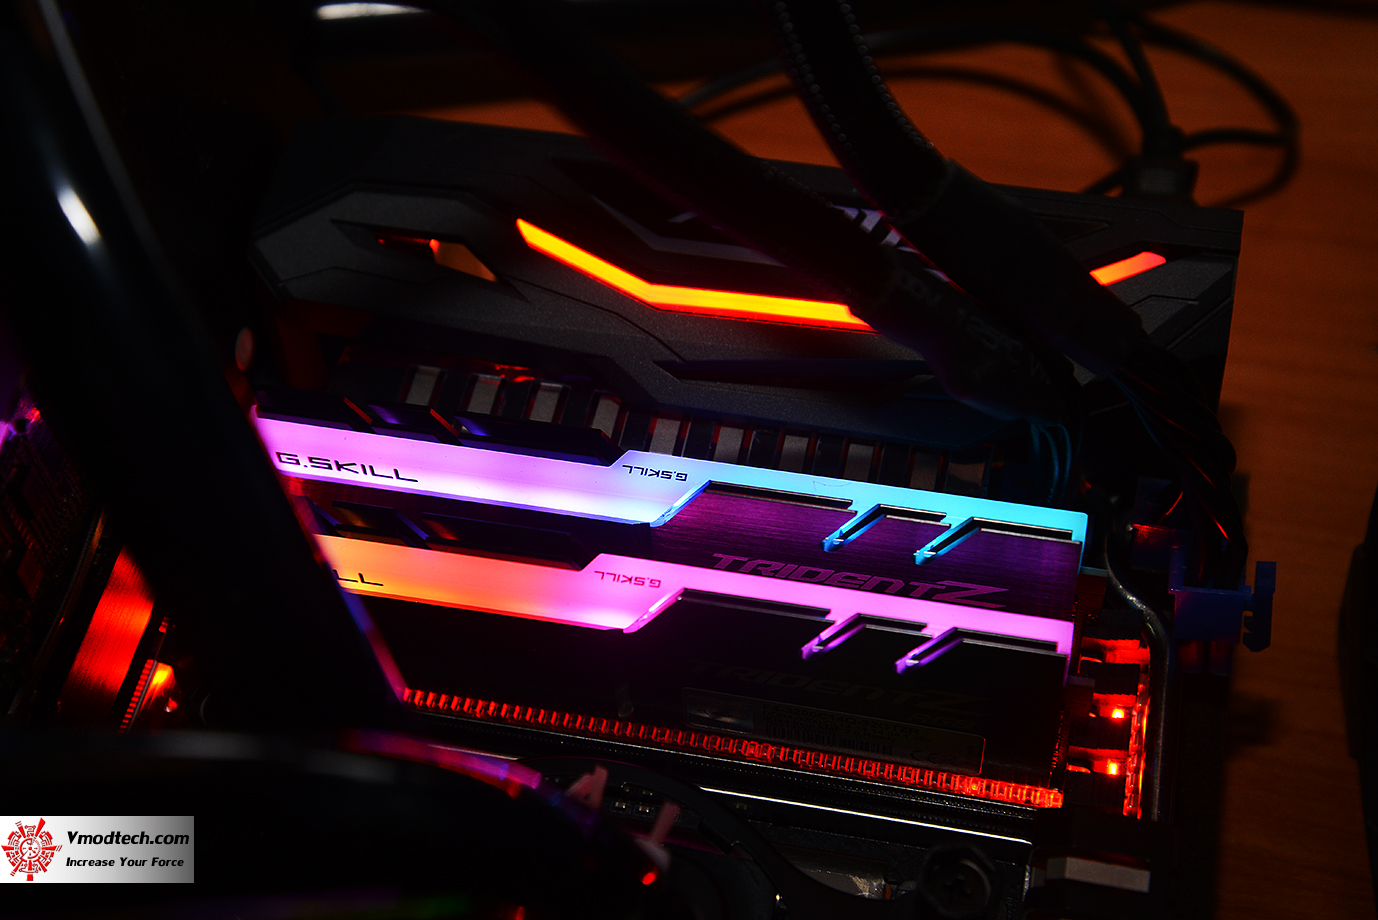 dsc 2989 G.SKILL Trident Z RGB DDR4 3200MHz 32GB (8GBx4) Quad Channel Review